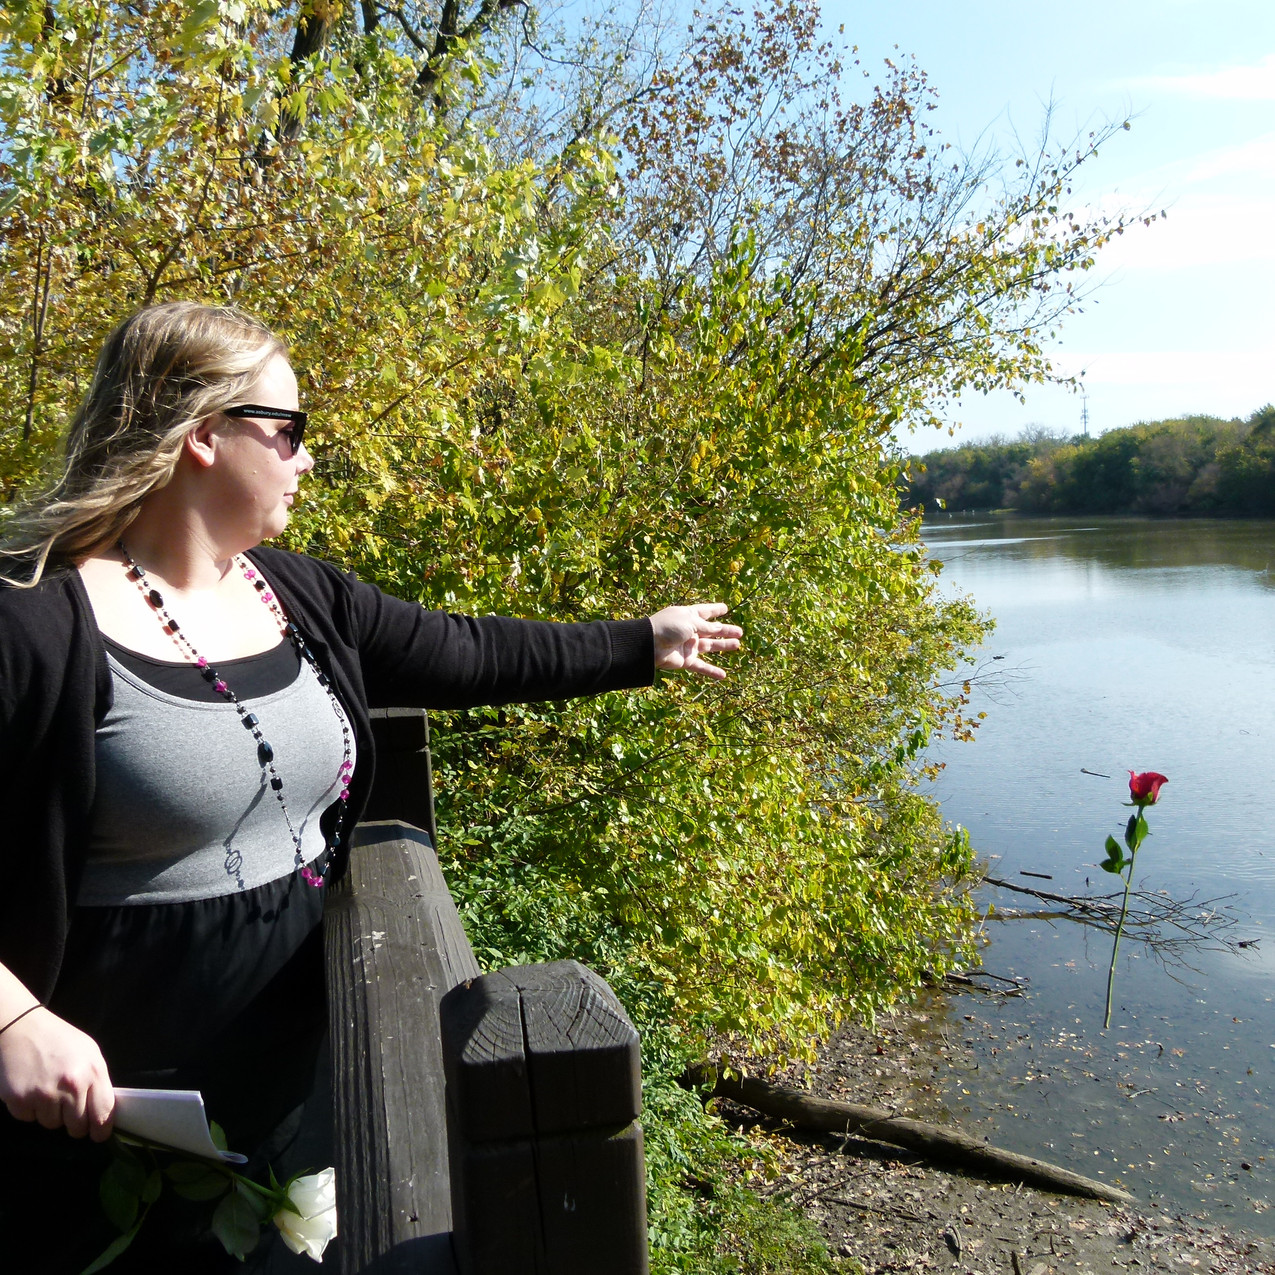 Kristine Oberlin tossing a rose